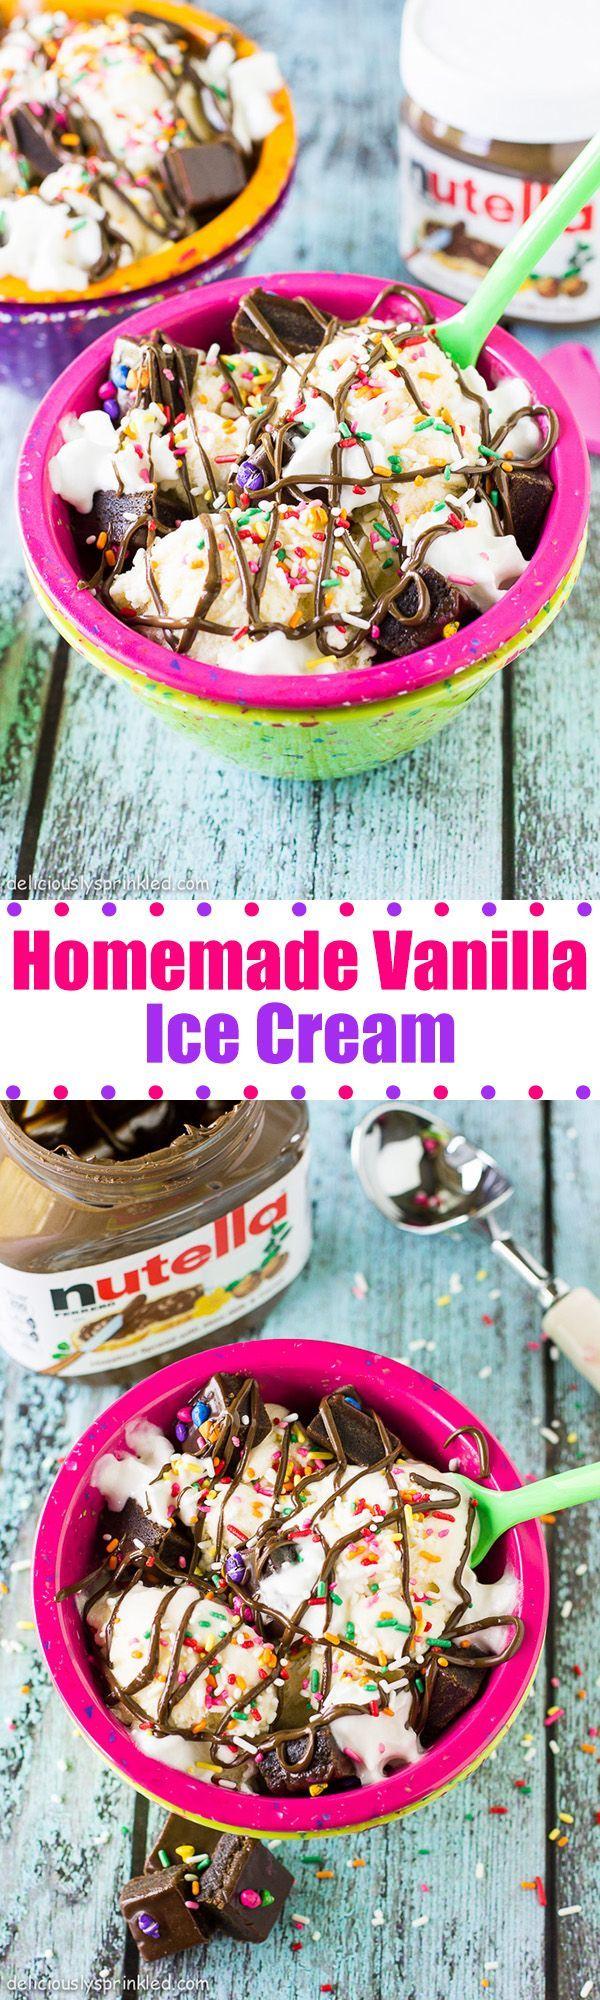 Homemade Vanilla Ice Cream--NO ICE CREAM MAKER REQUIRED!